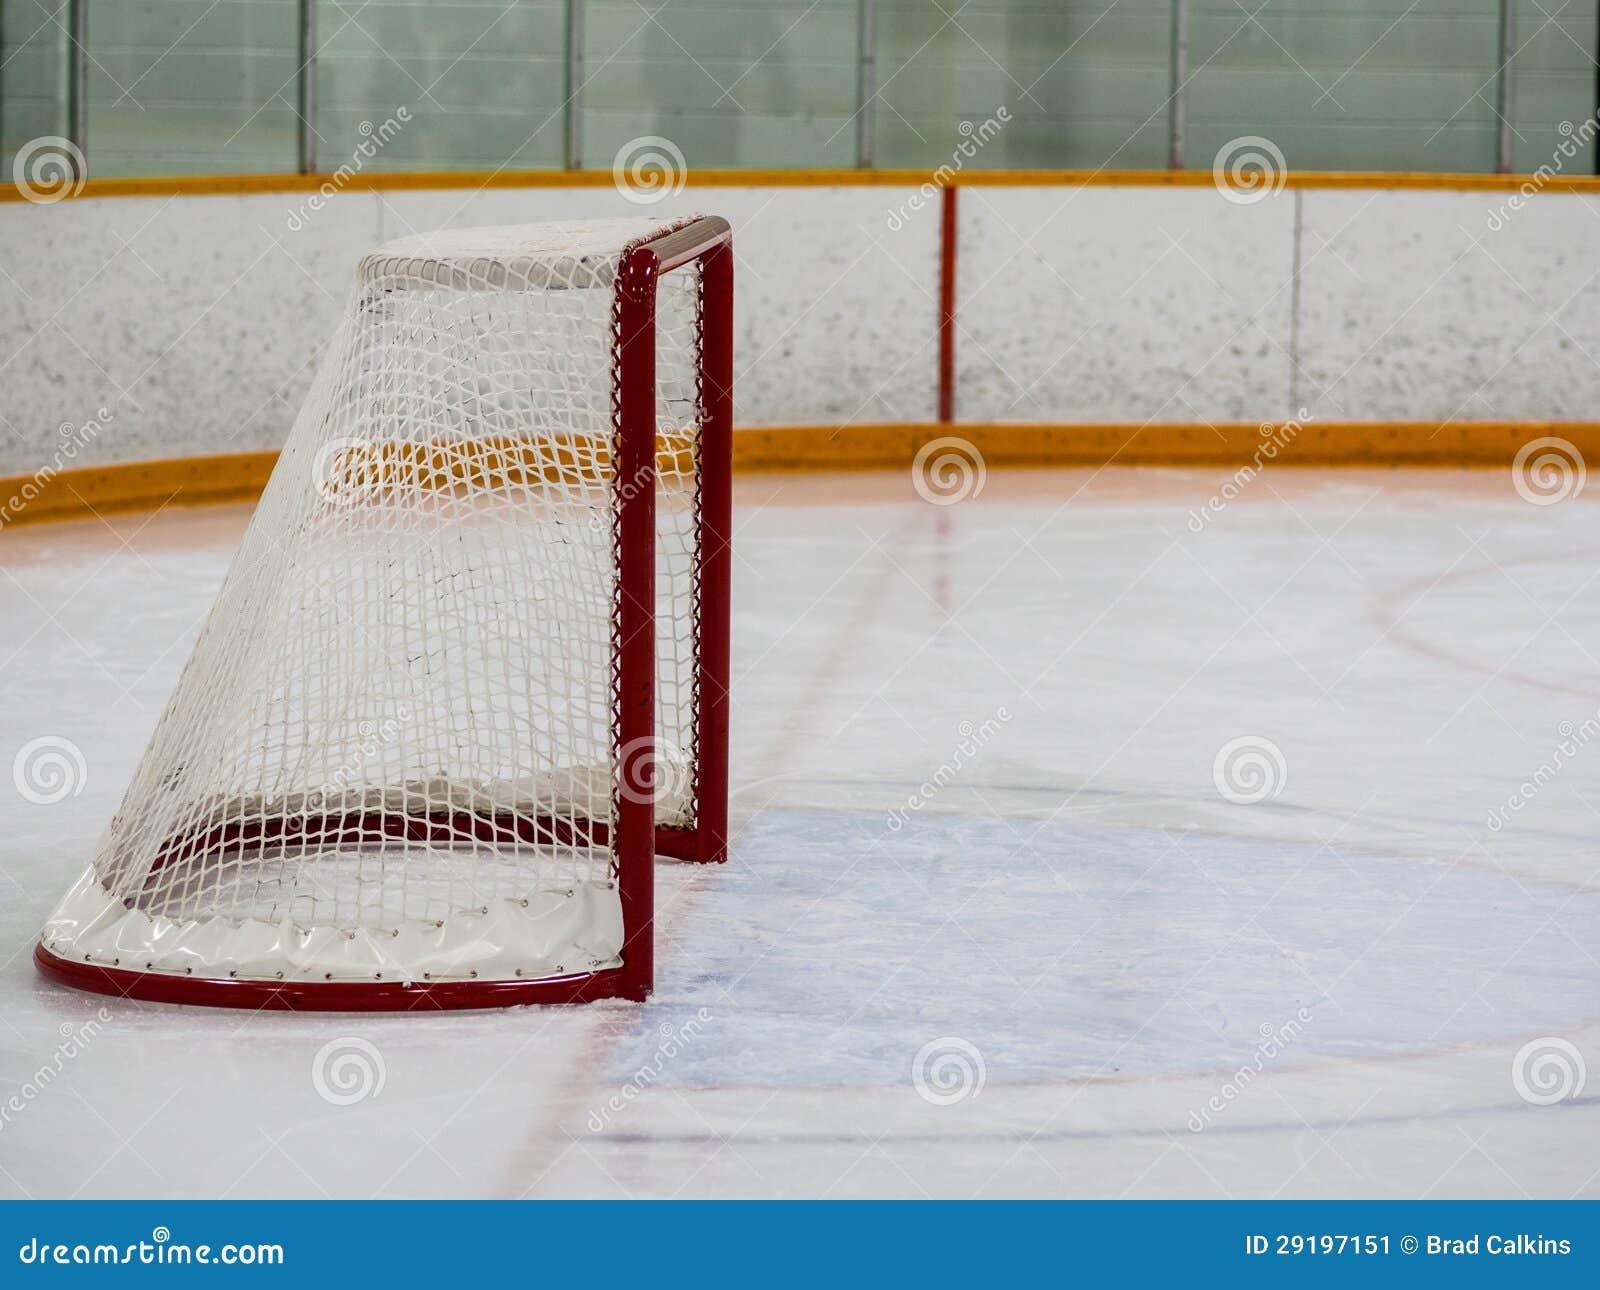 Empty hockey net